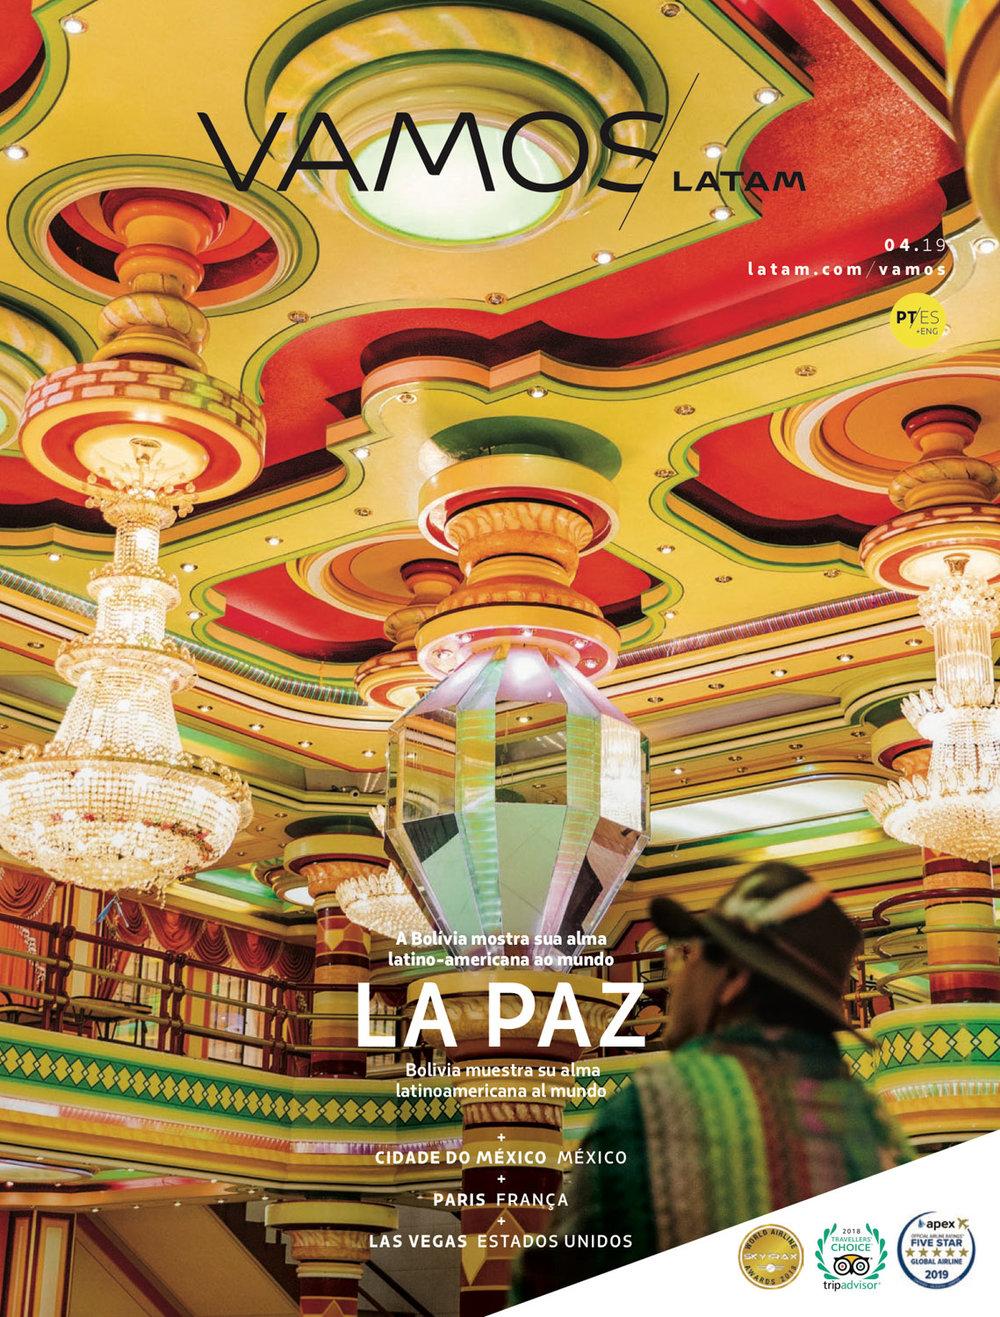 VAMOS-Latam - La Paz_AngeloDalBo_01.jpg